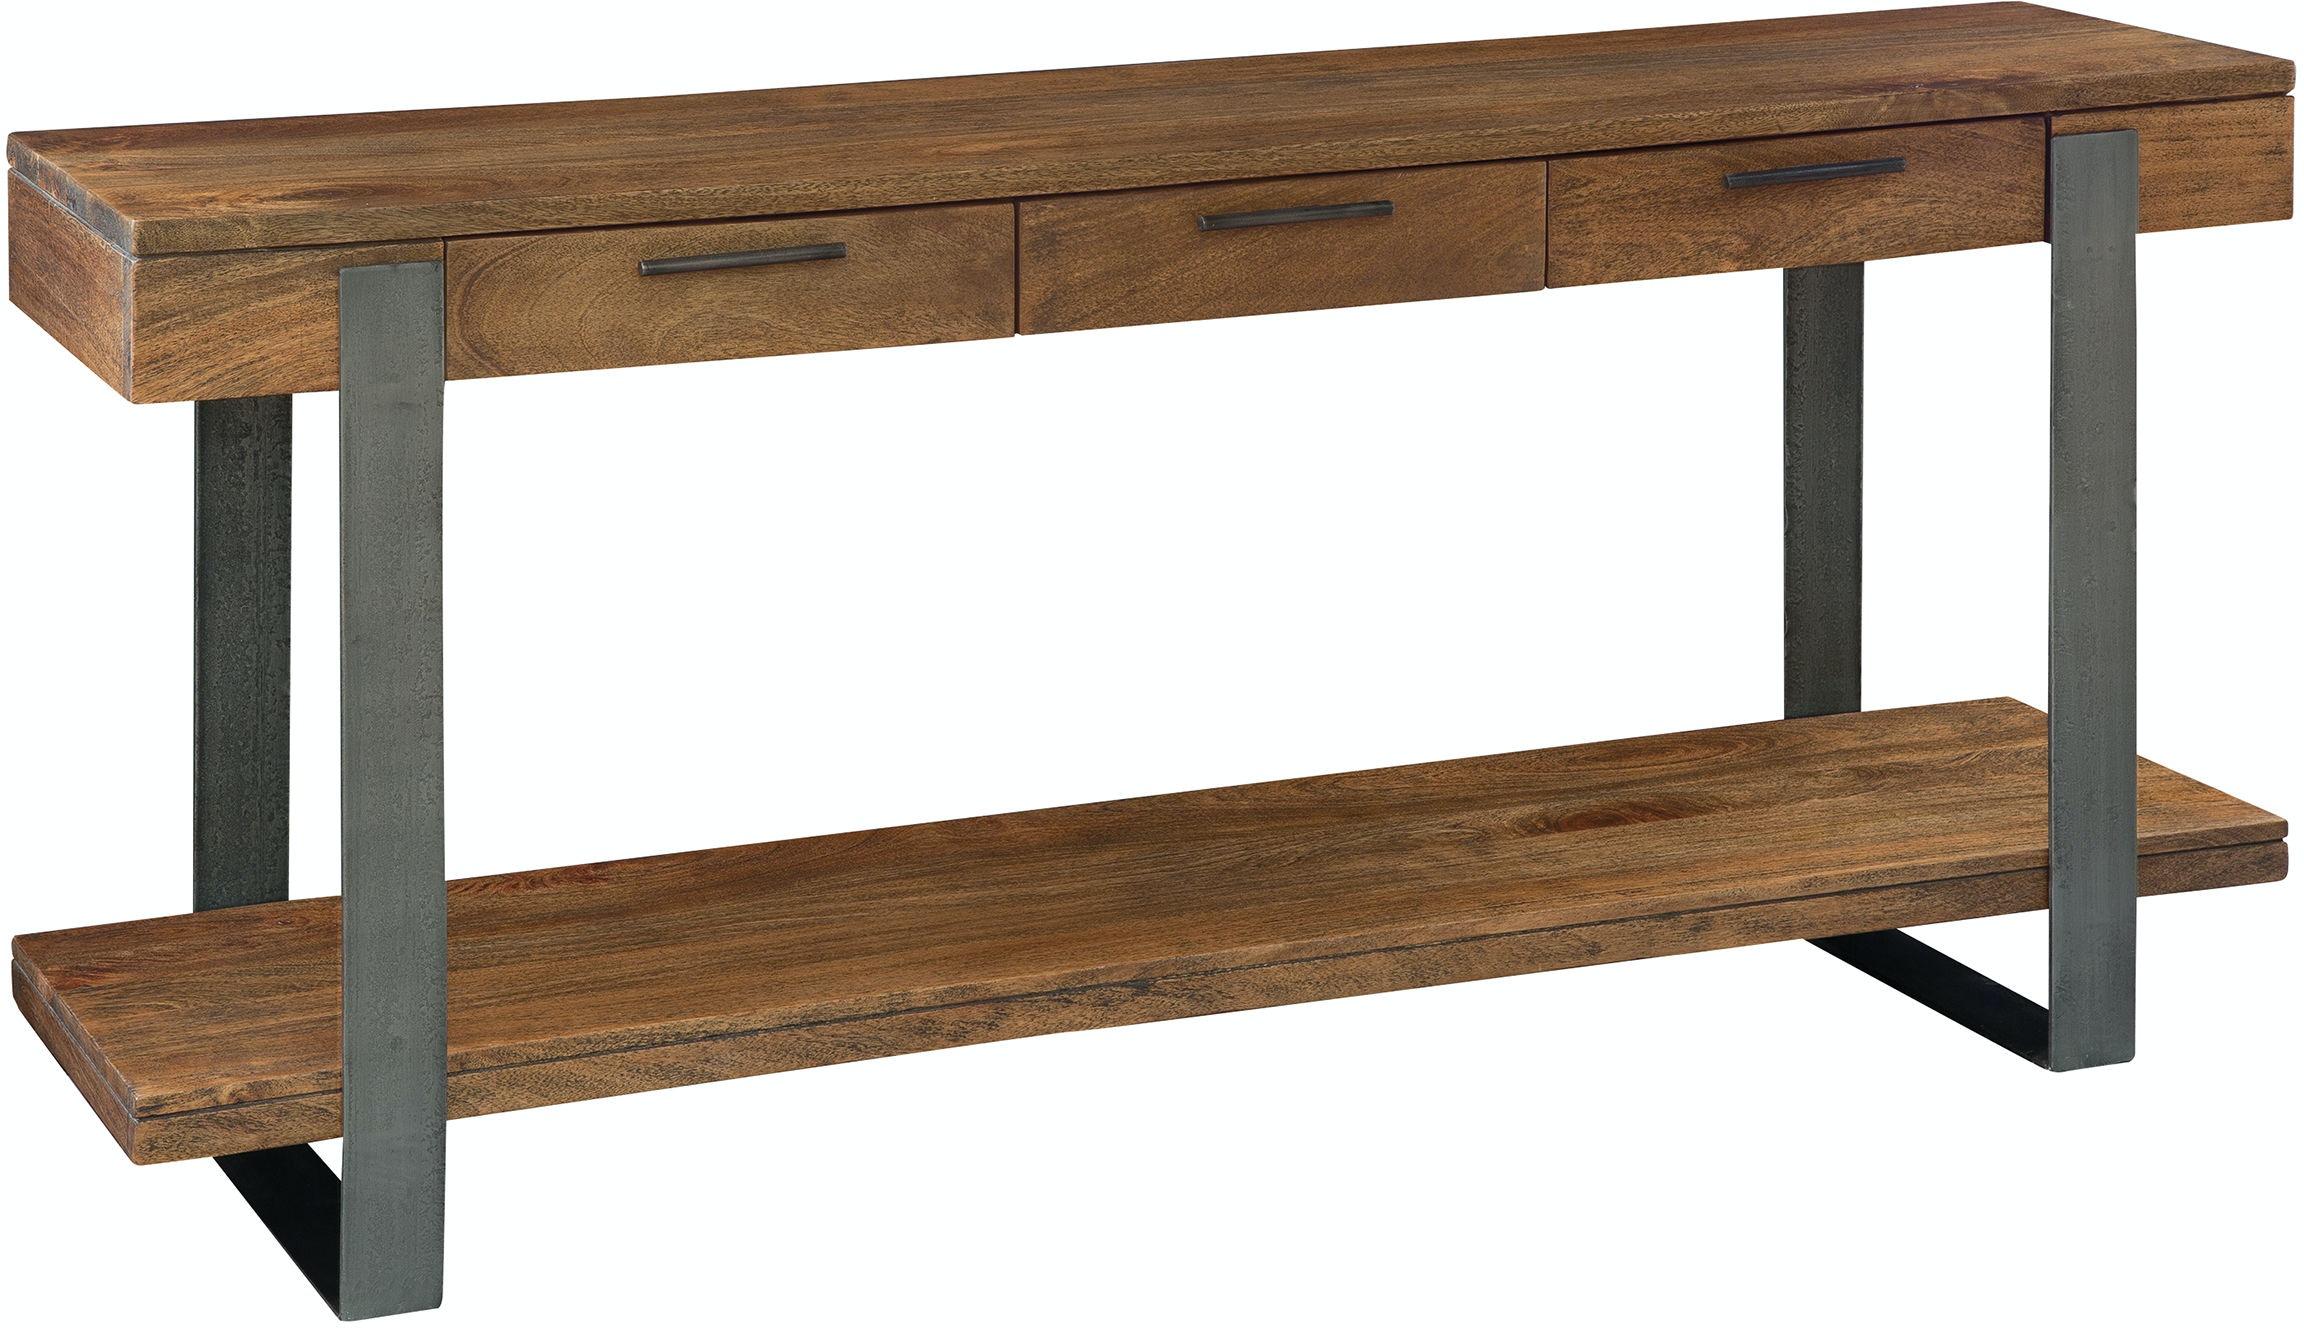 Hekman Iron Strapping Sofa Table